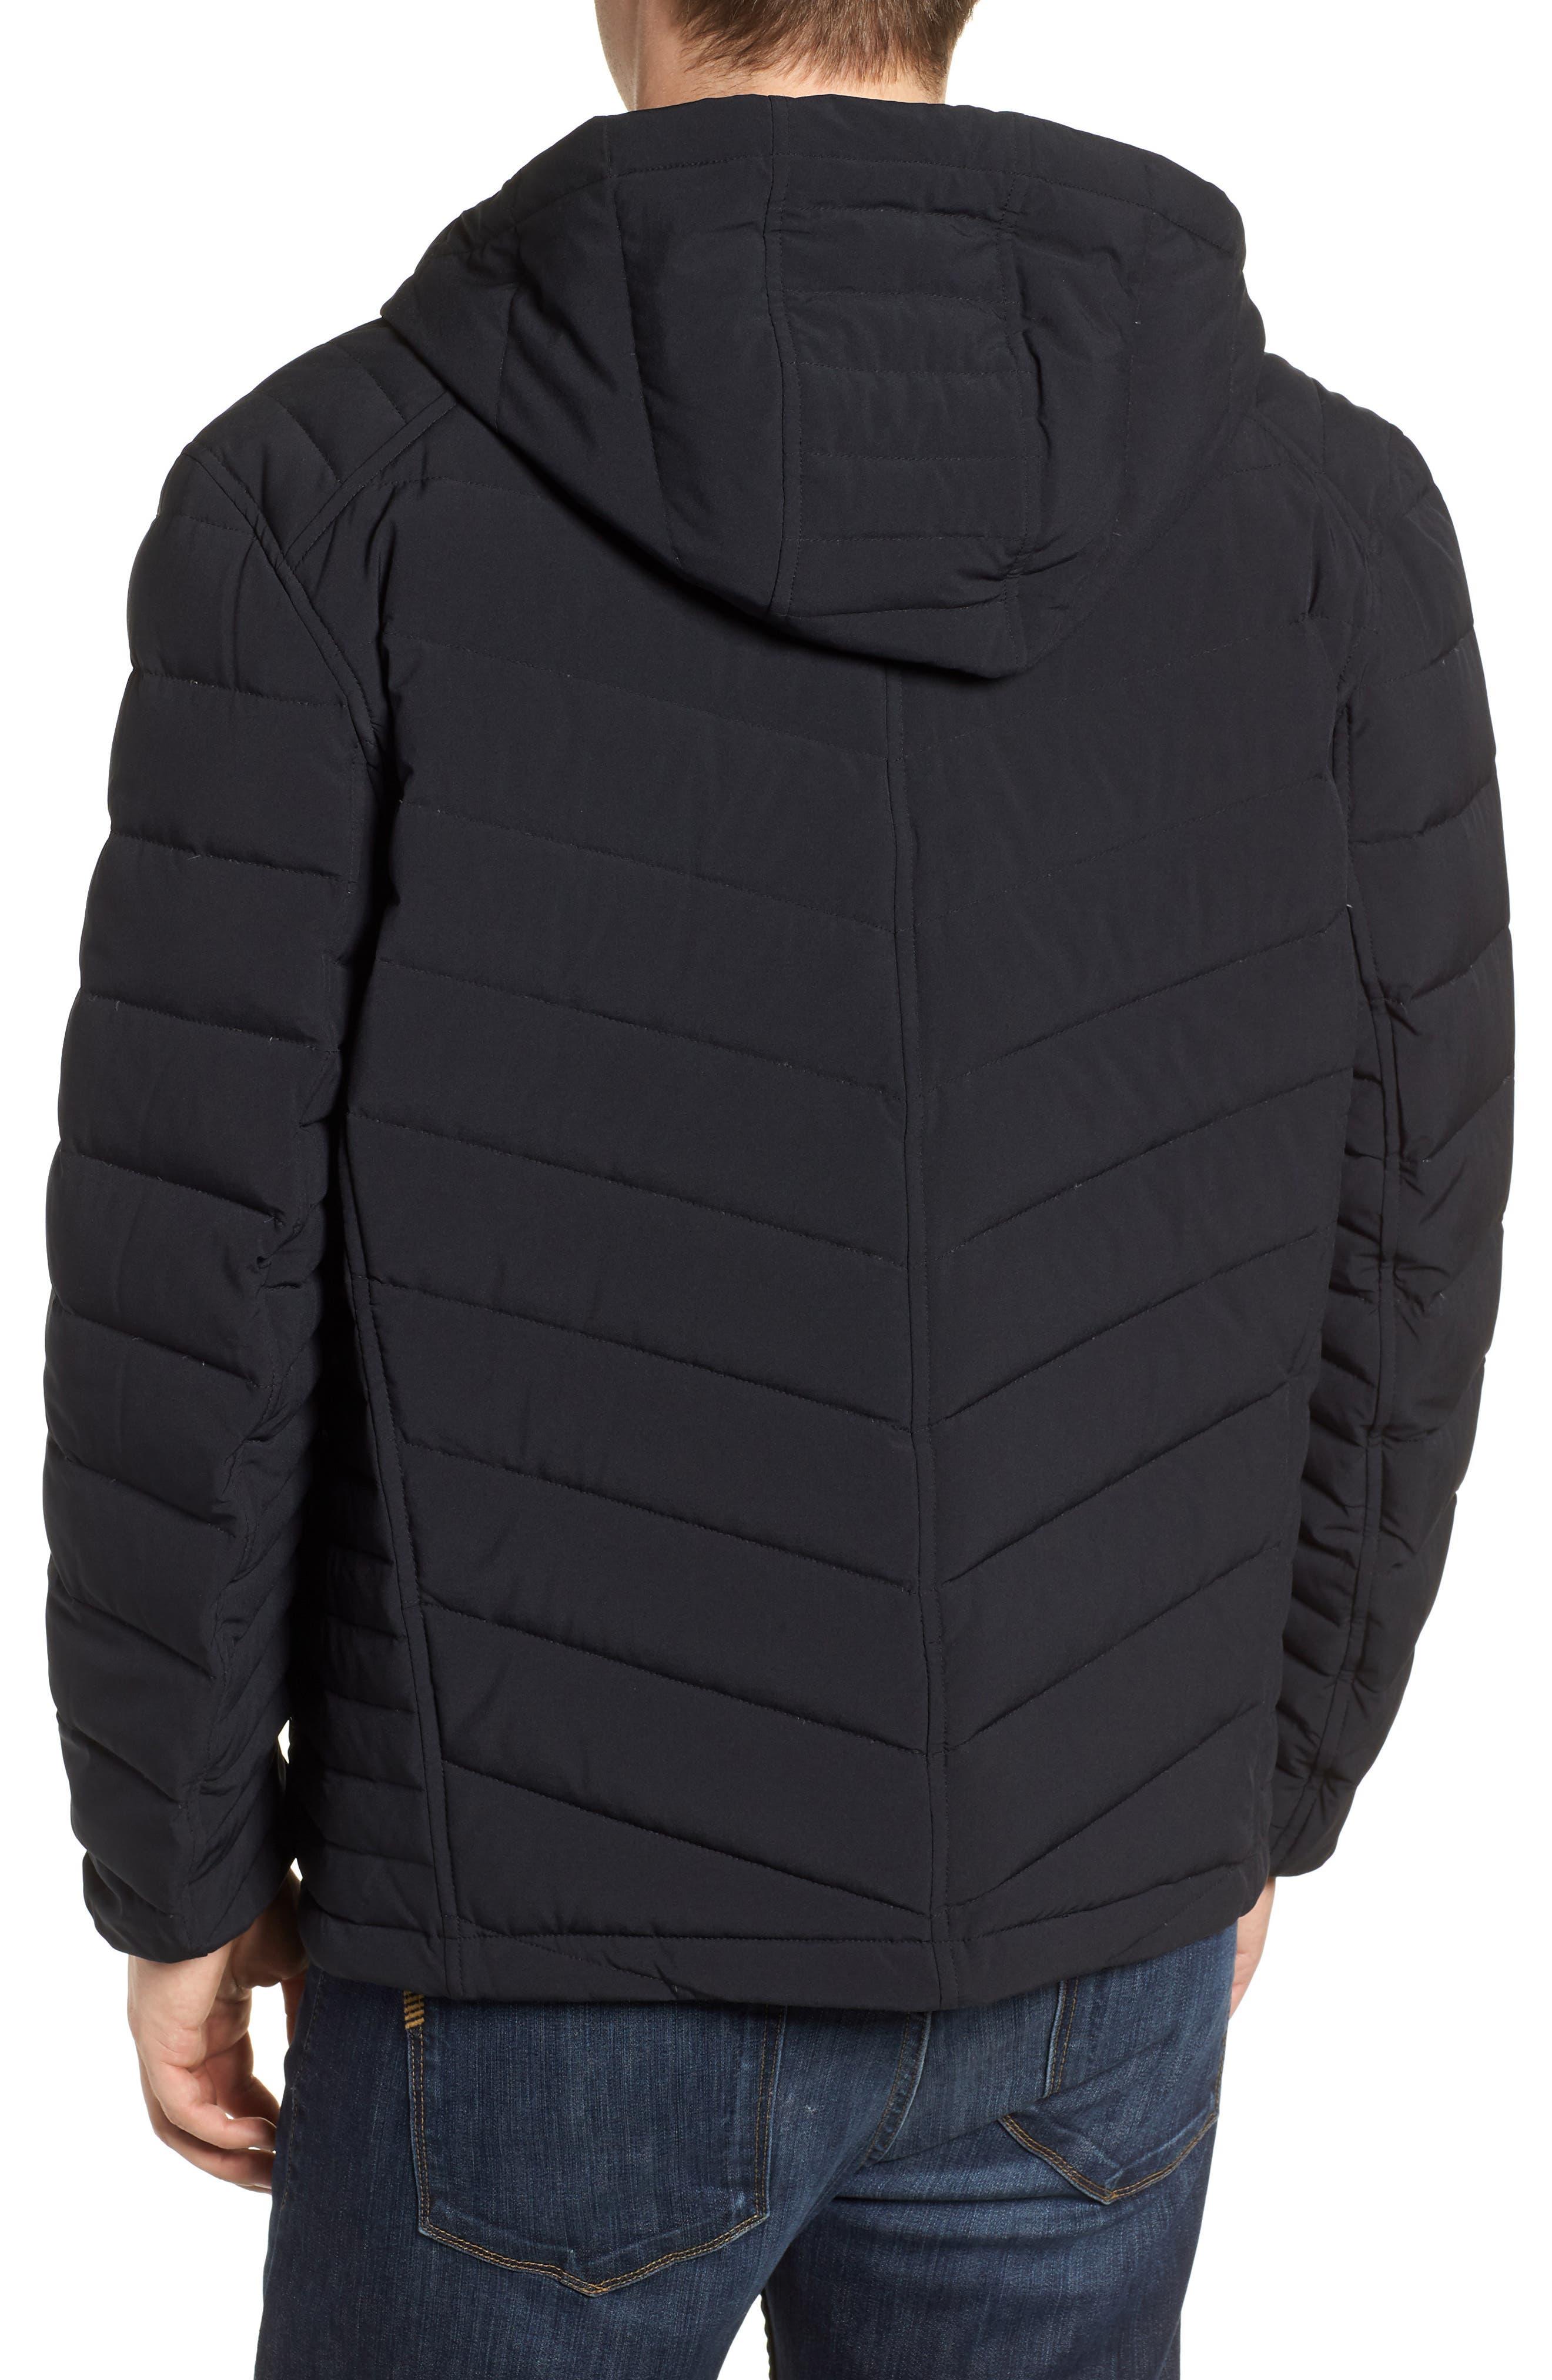 MARC NEW YORK, Delavan Down Hooded Jacket, Alternate thumbnail 2, color, BLACK